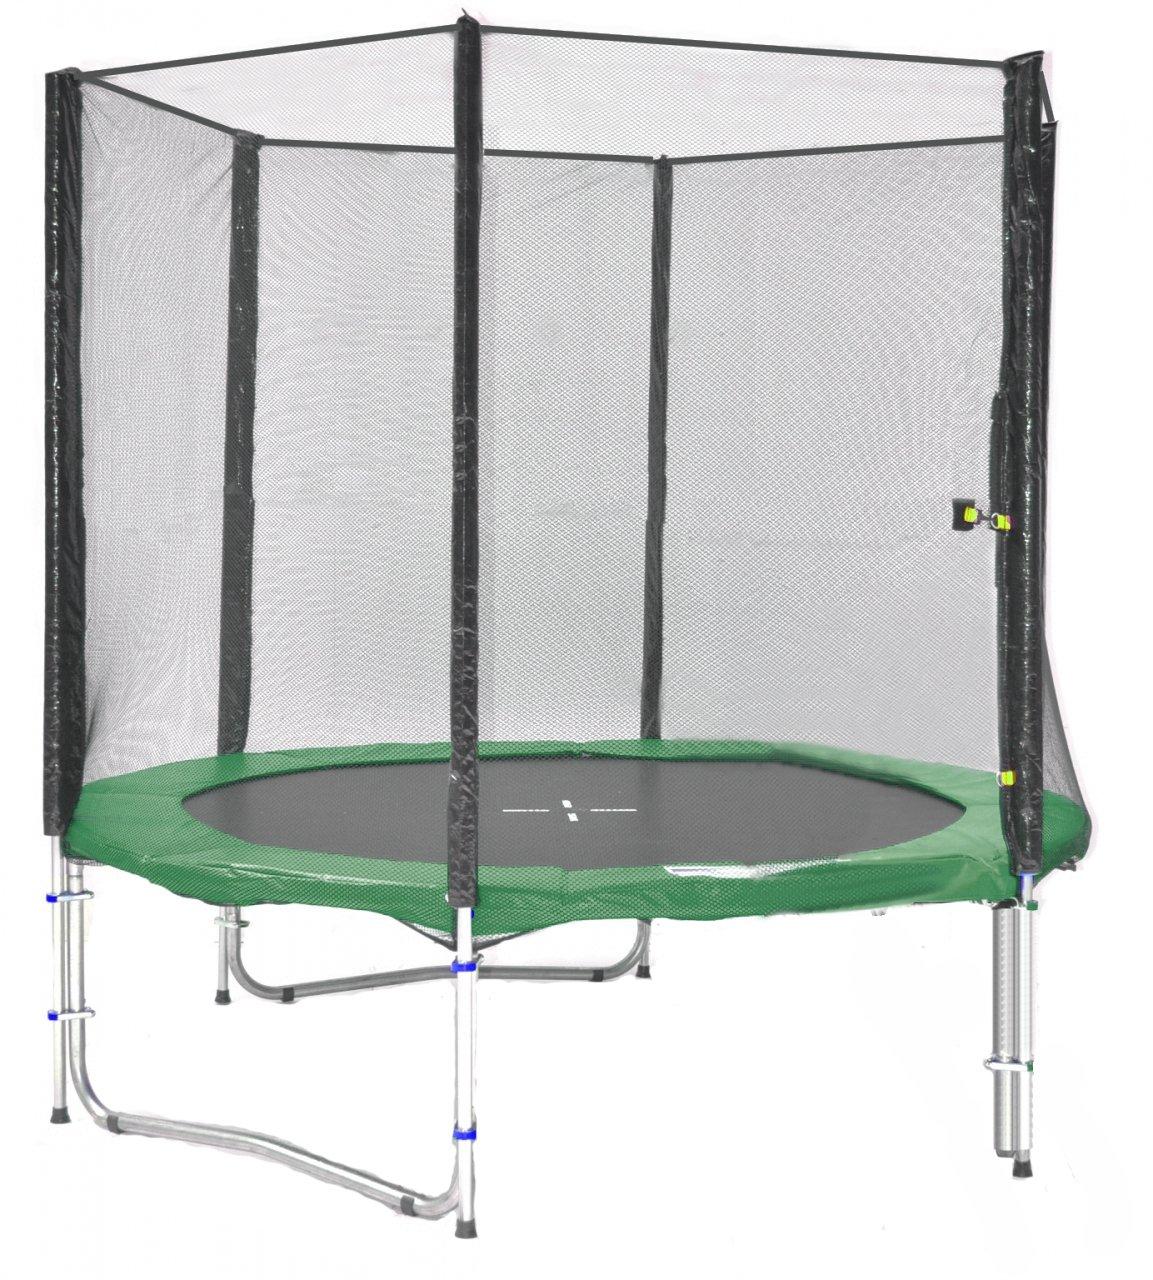 SB-185-G Gartentrampolin 185cm incl. Netz, 90kg Traglast günstig bestellen